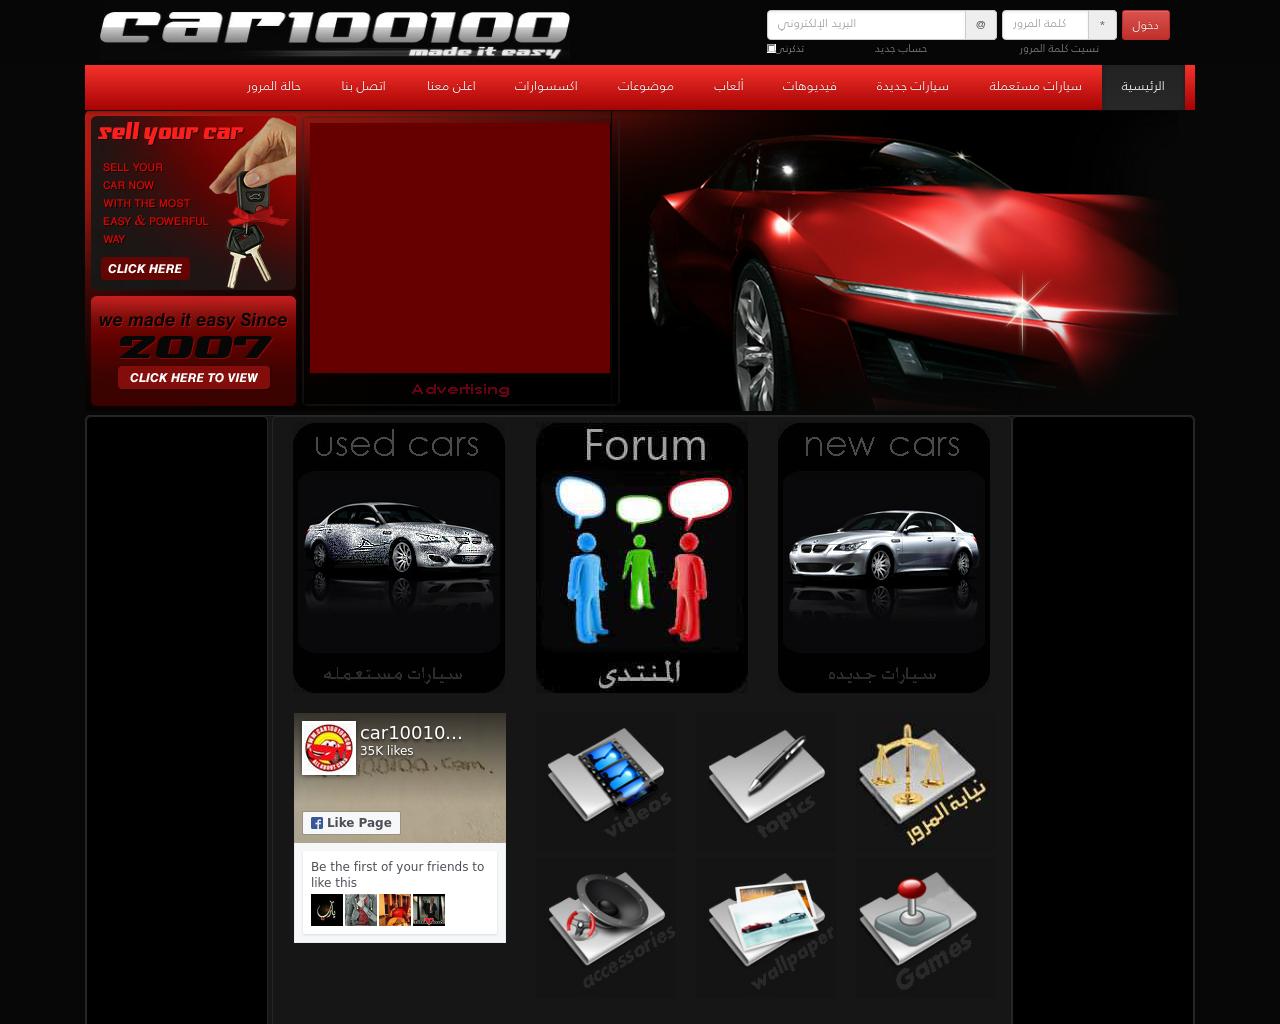 Car-100-100-Advertising-Reviews-Pricing